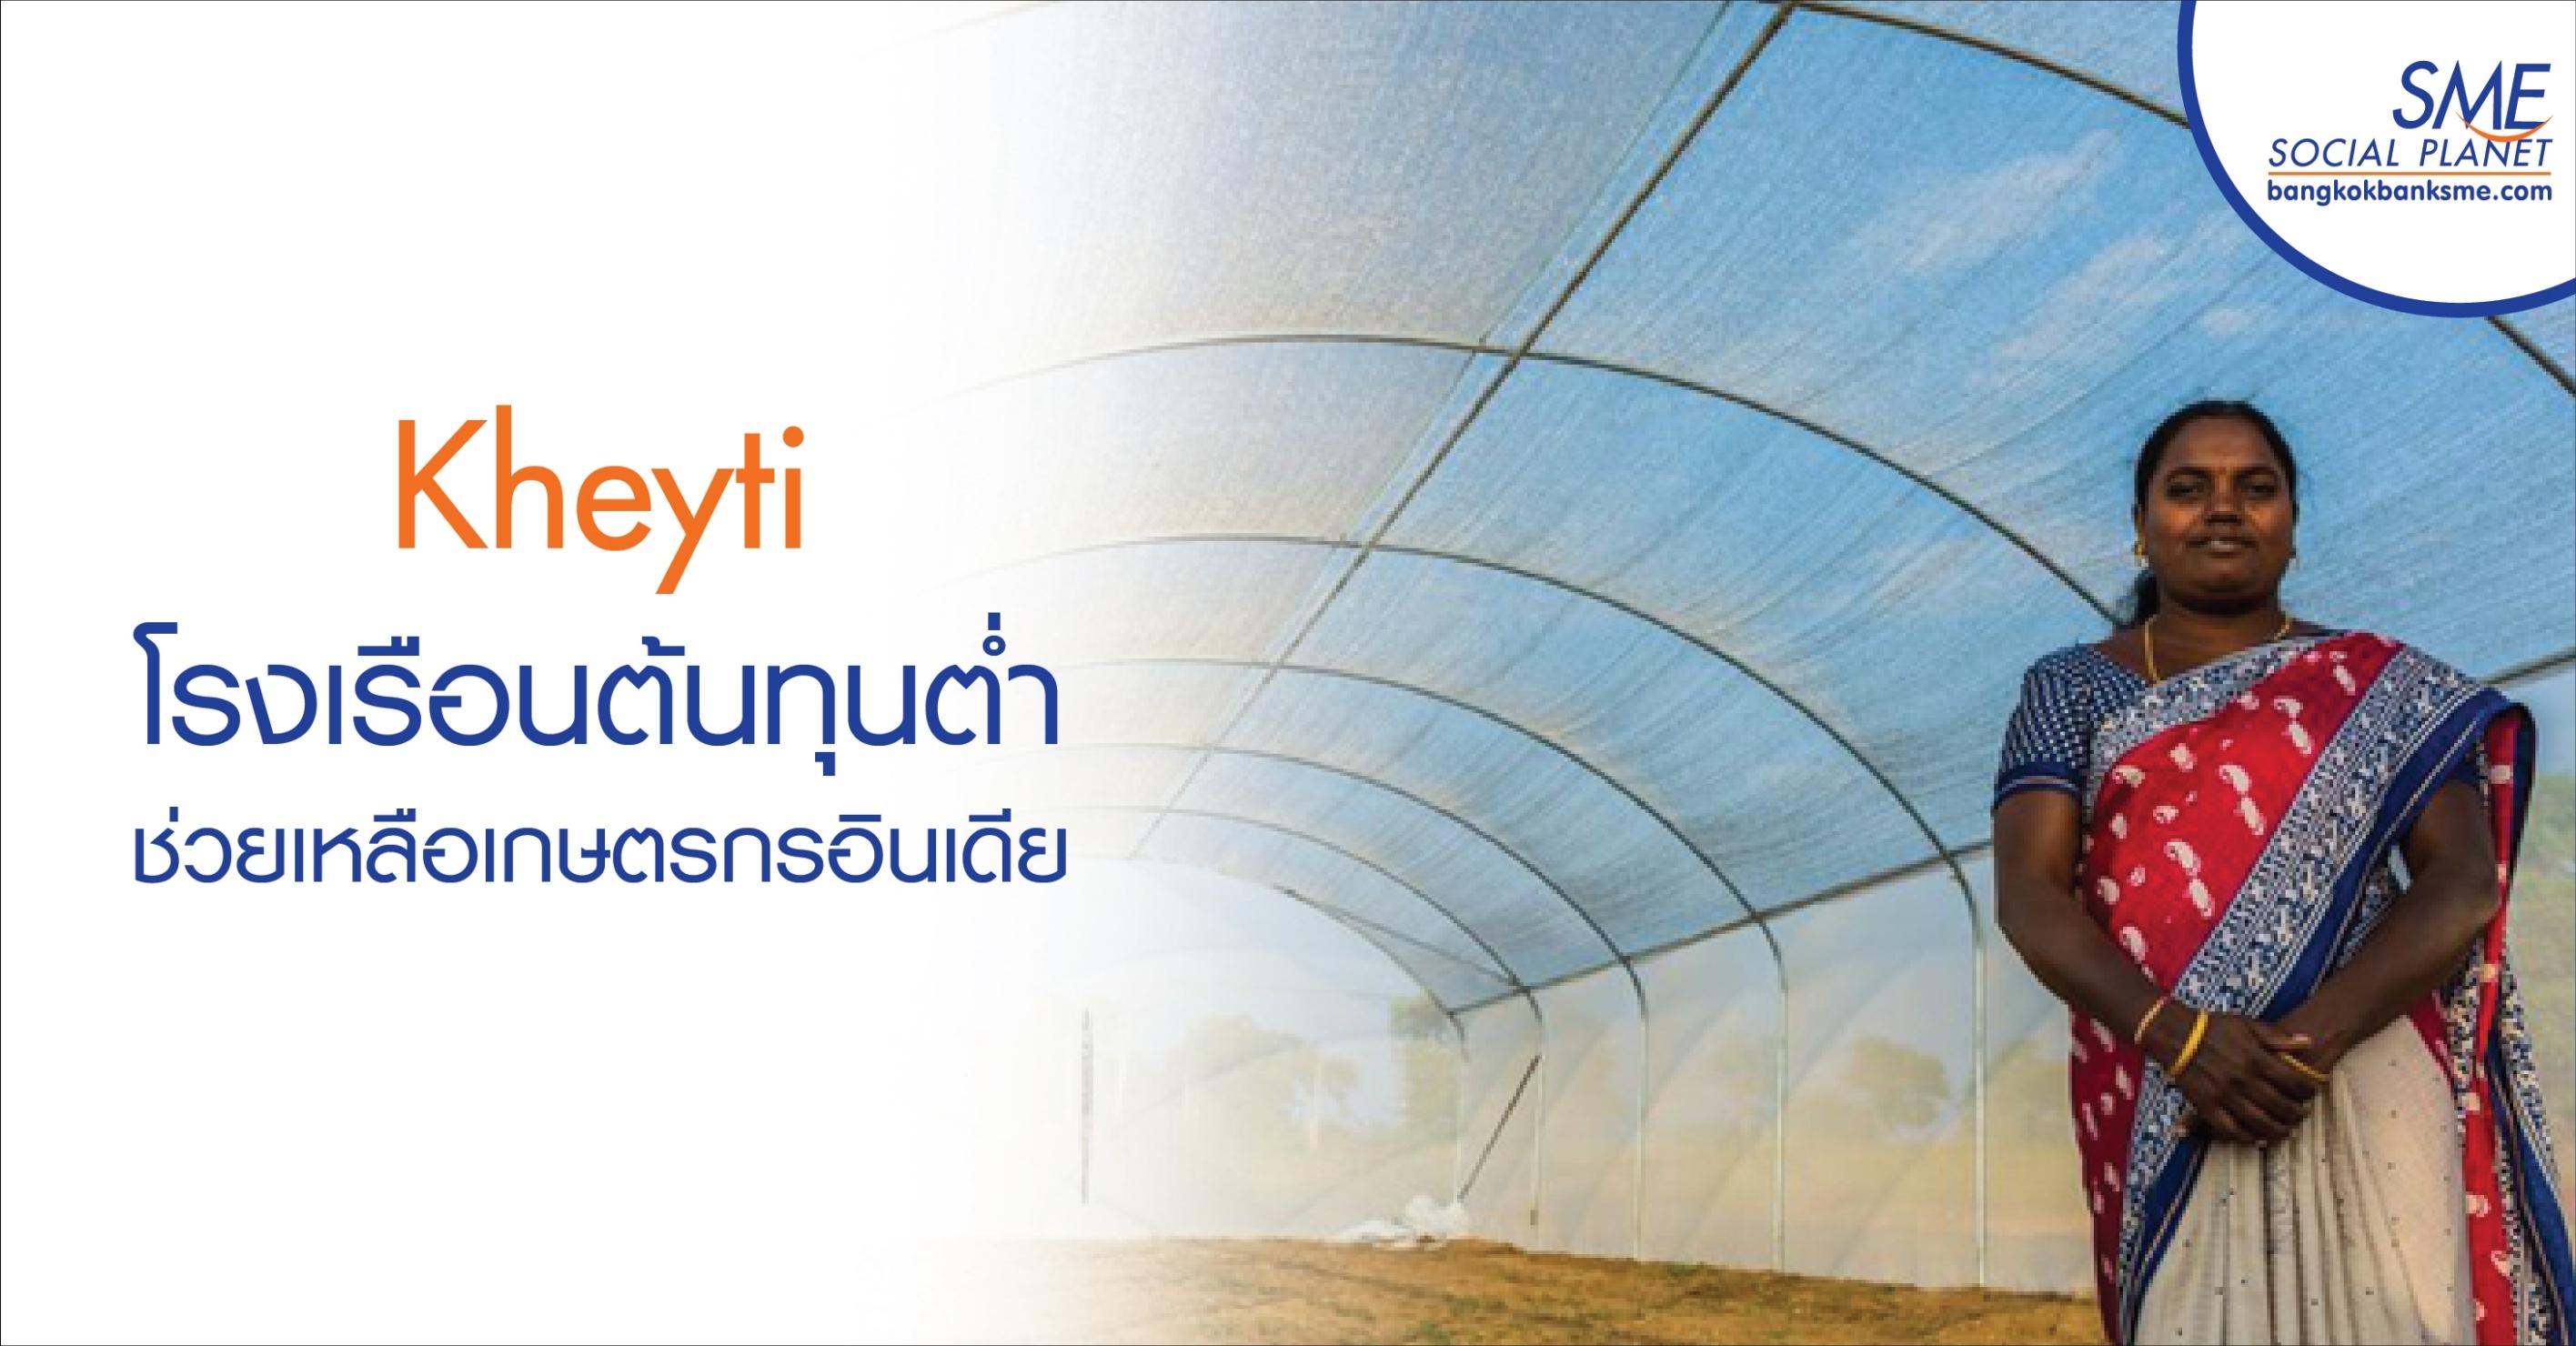 Kheyti โรงเรือนต้นทุนต่ำช่วยเหลือเกษตรกรอินเดีย